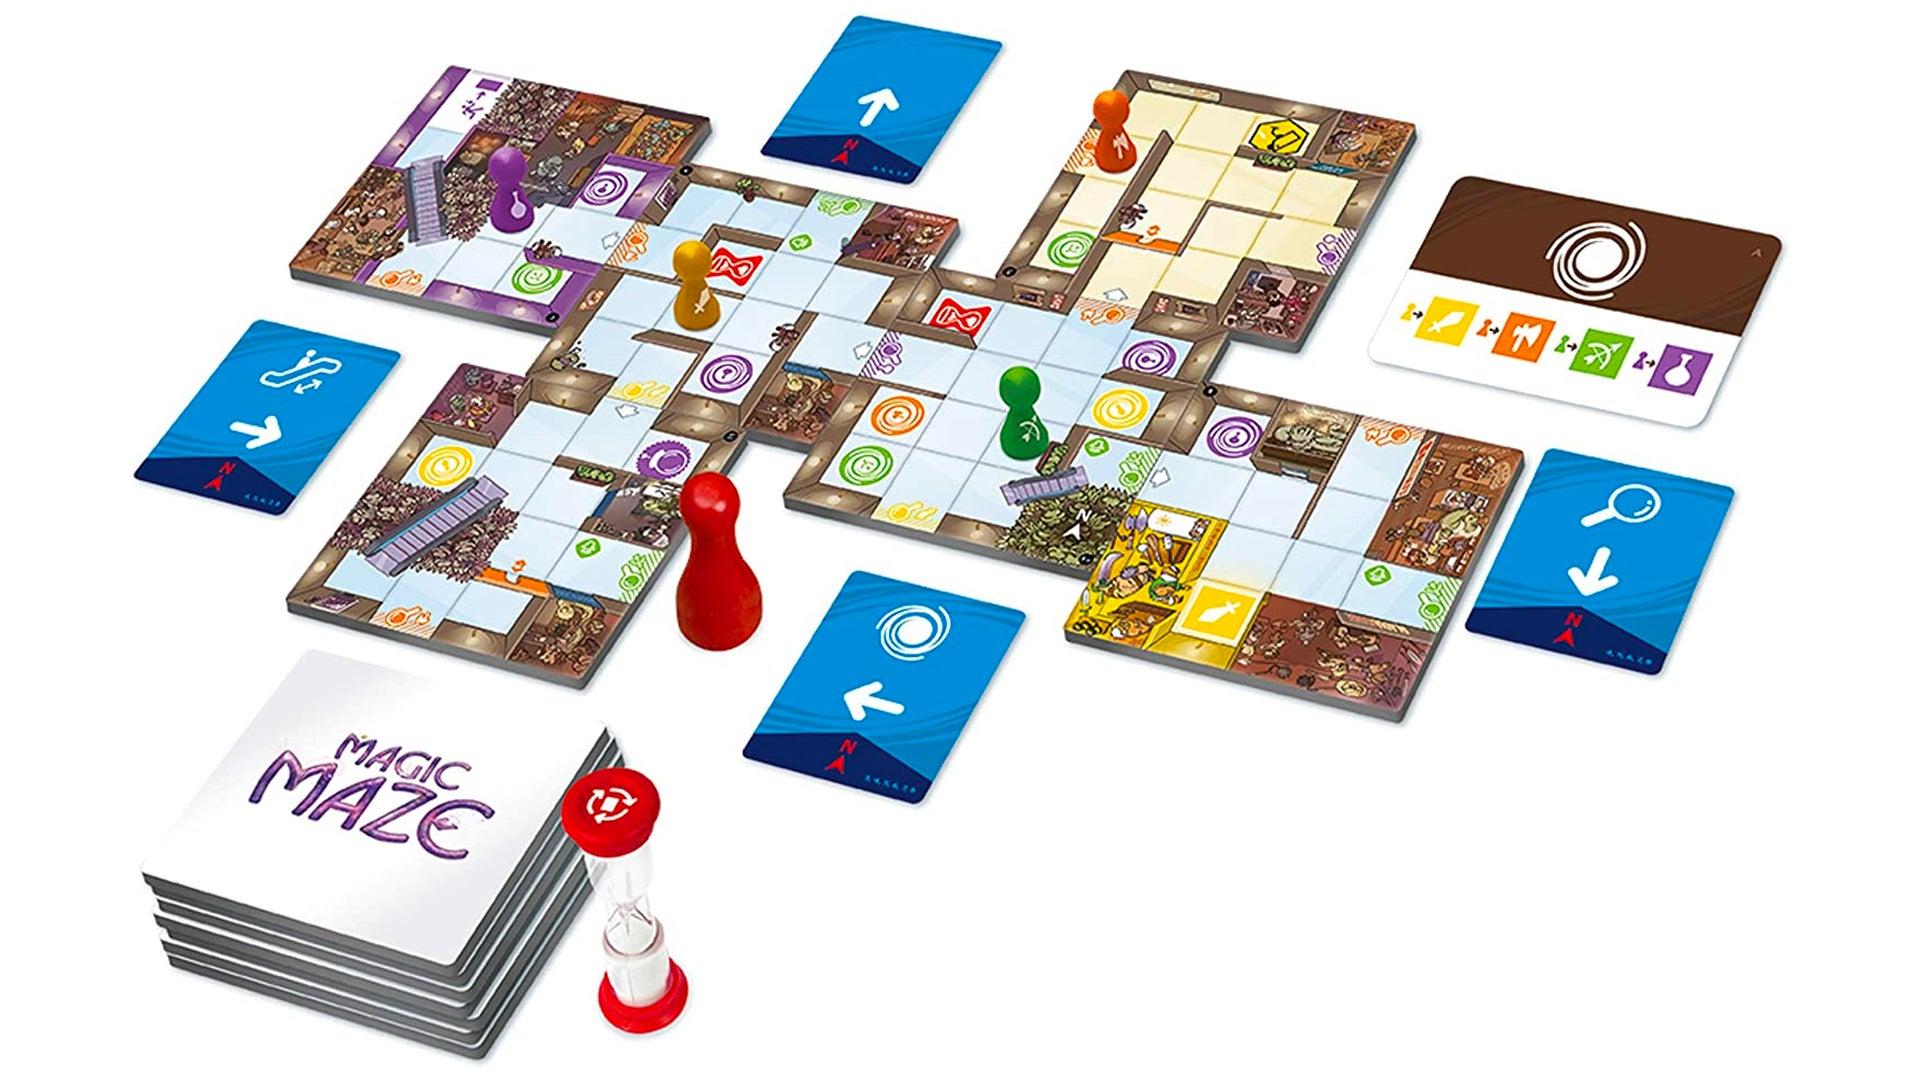 magic-maze-board-game-gameplay-layout.jpg